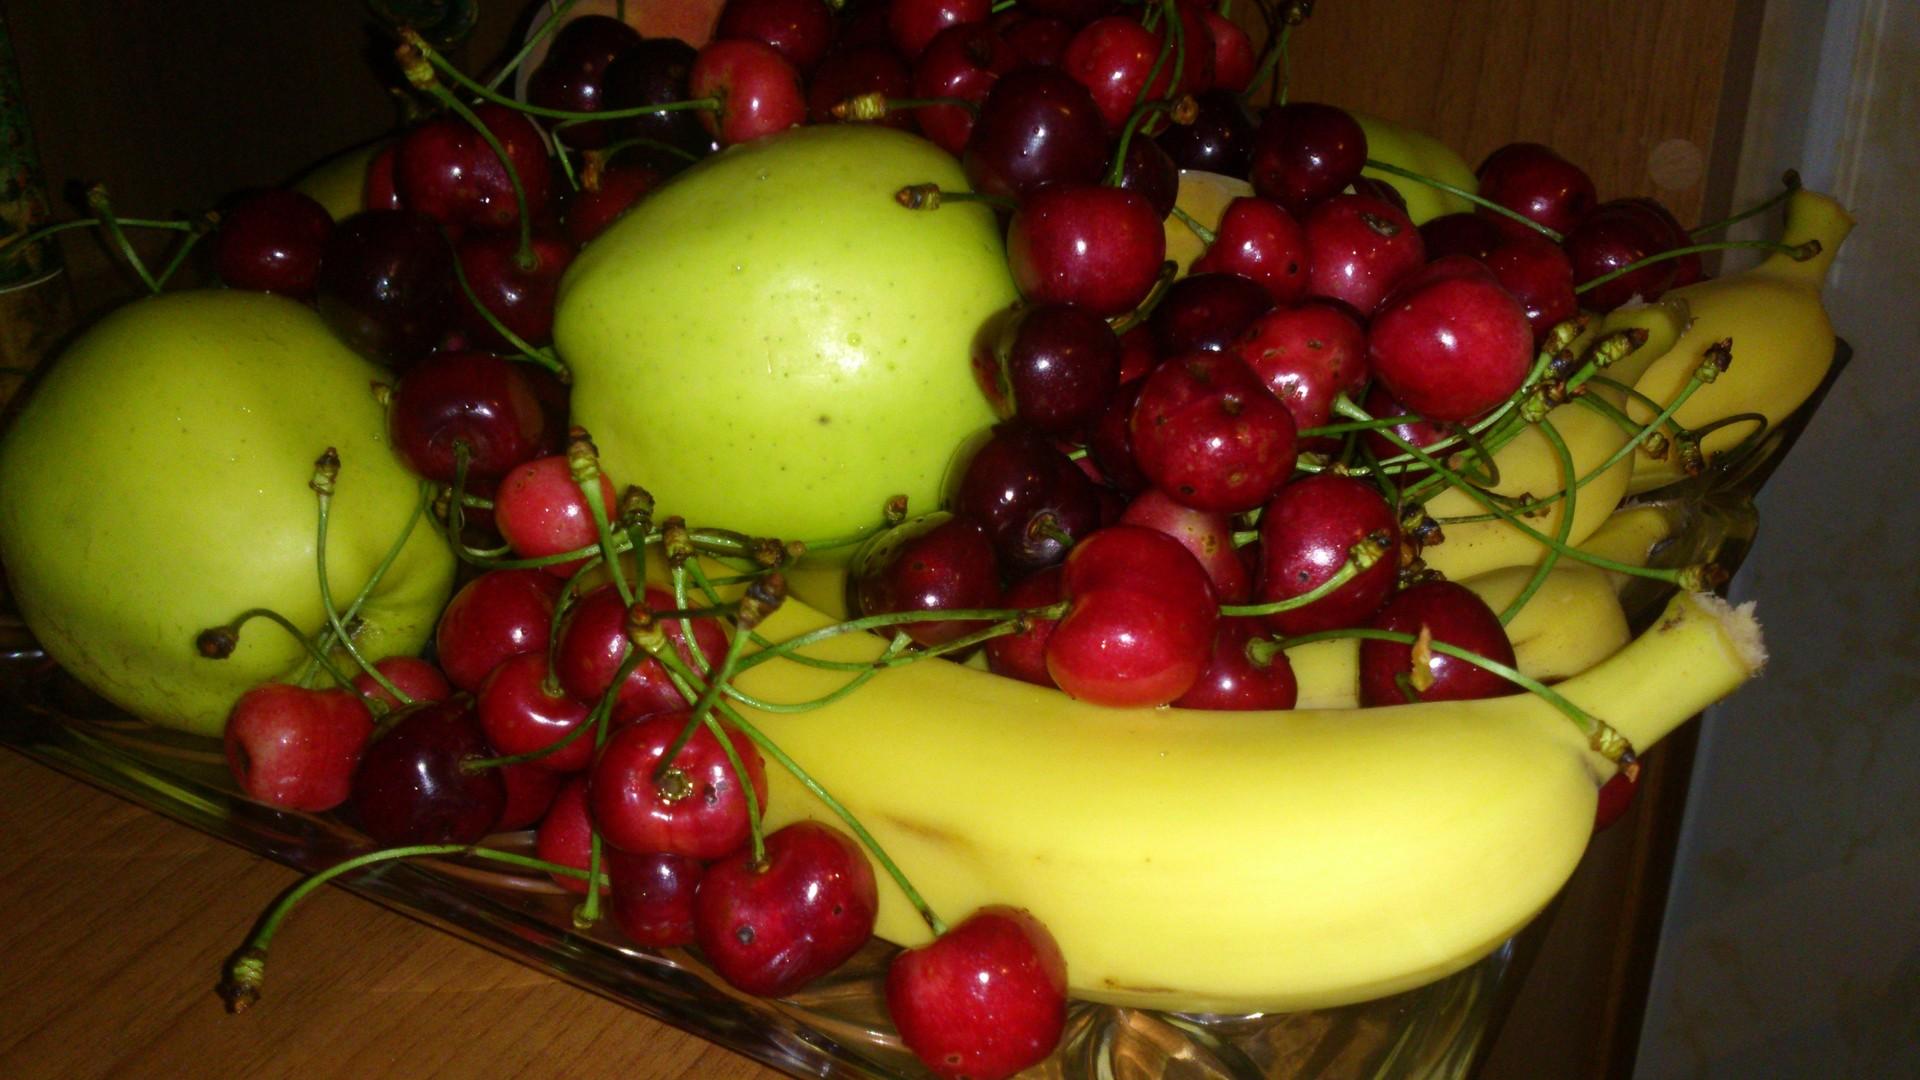 summer-fruit-c168c5f5d6b0480c68d4d2bbb0b